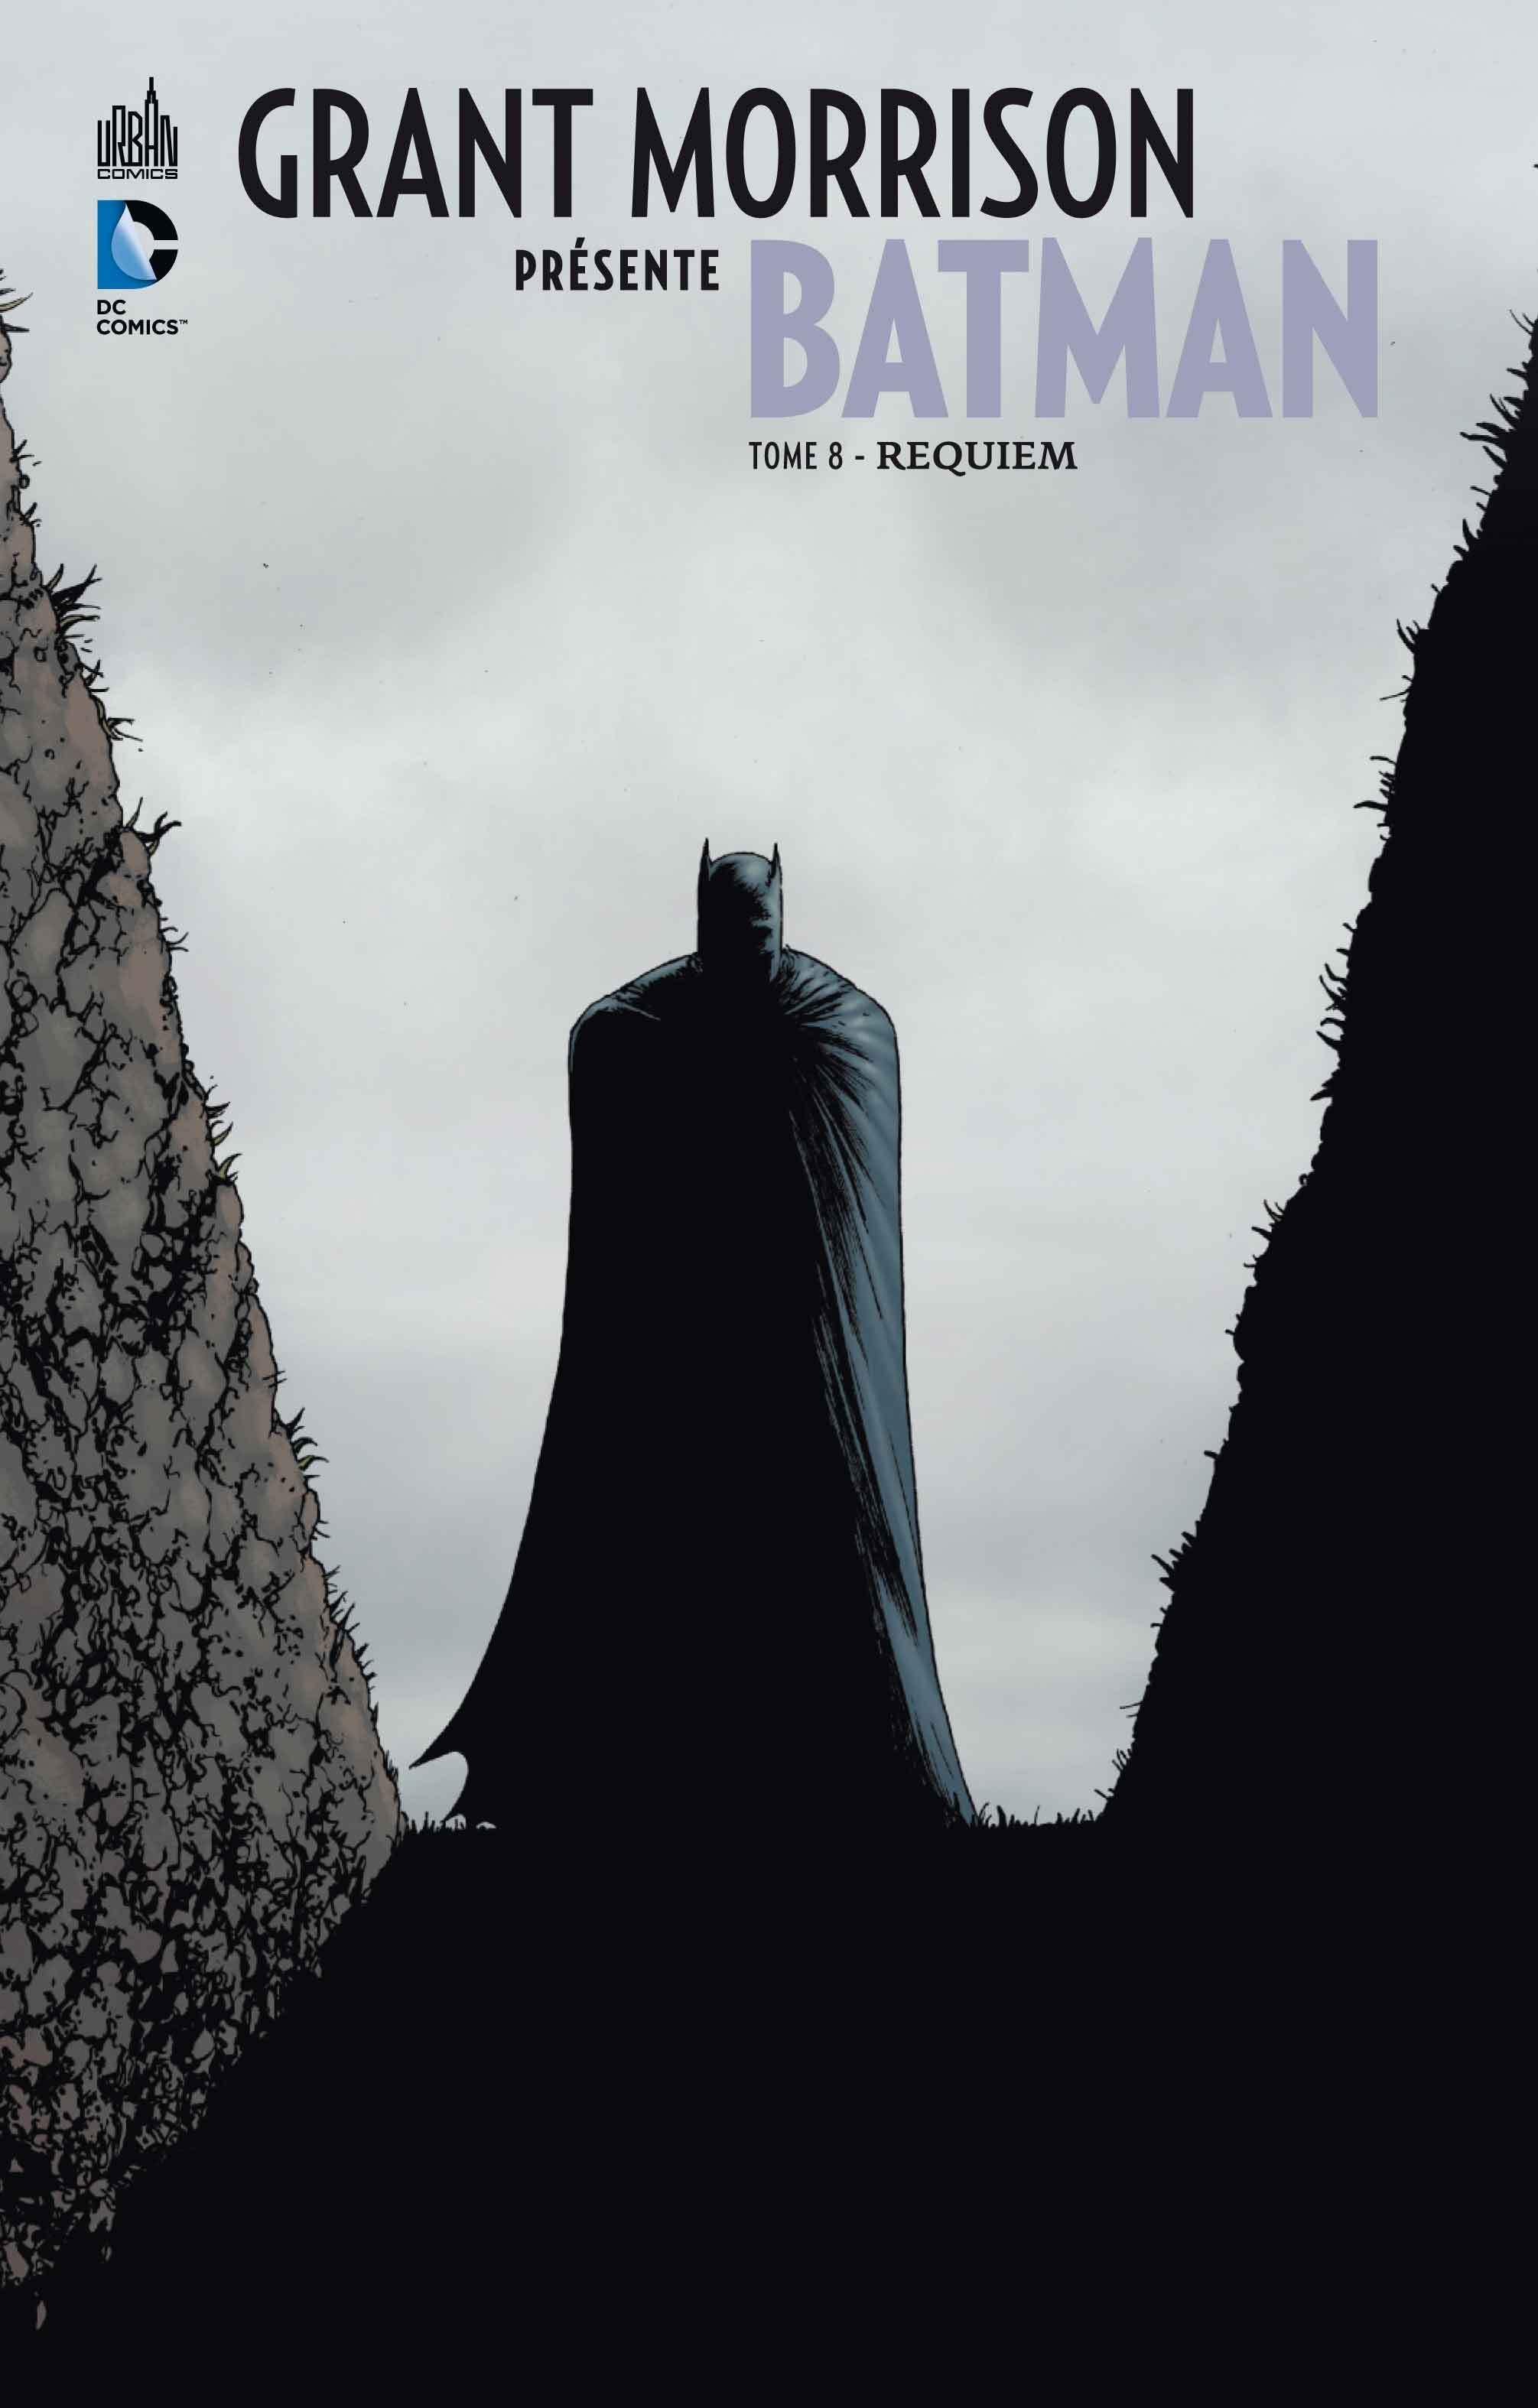 DC SIGNATURES - GRANT MORRISON PRESENTE BATMAN TOME 8